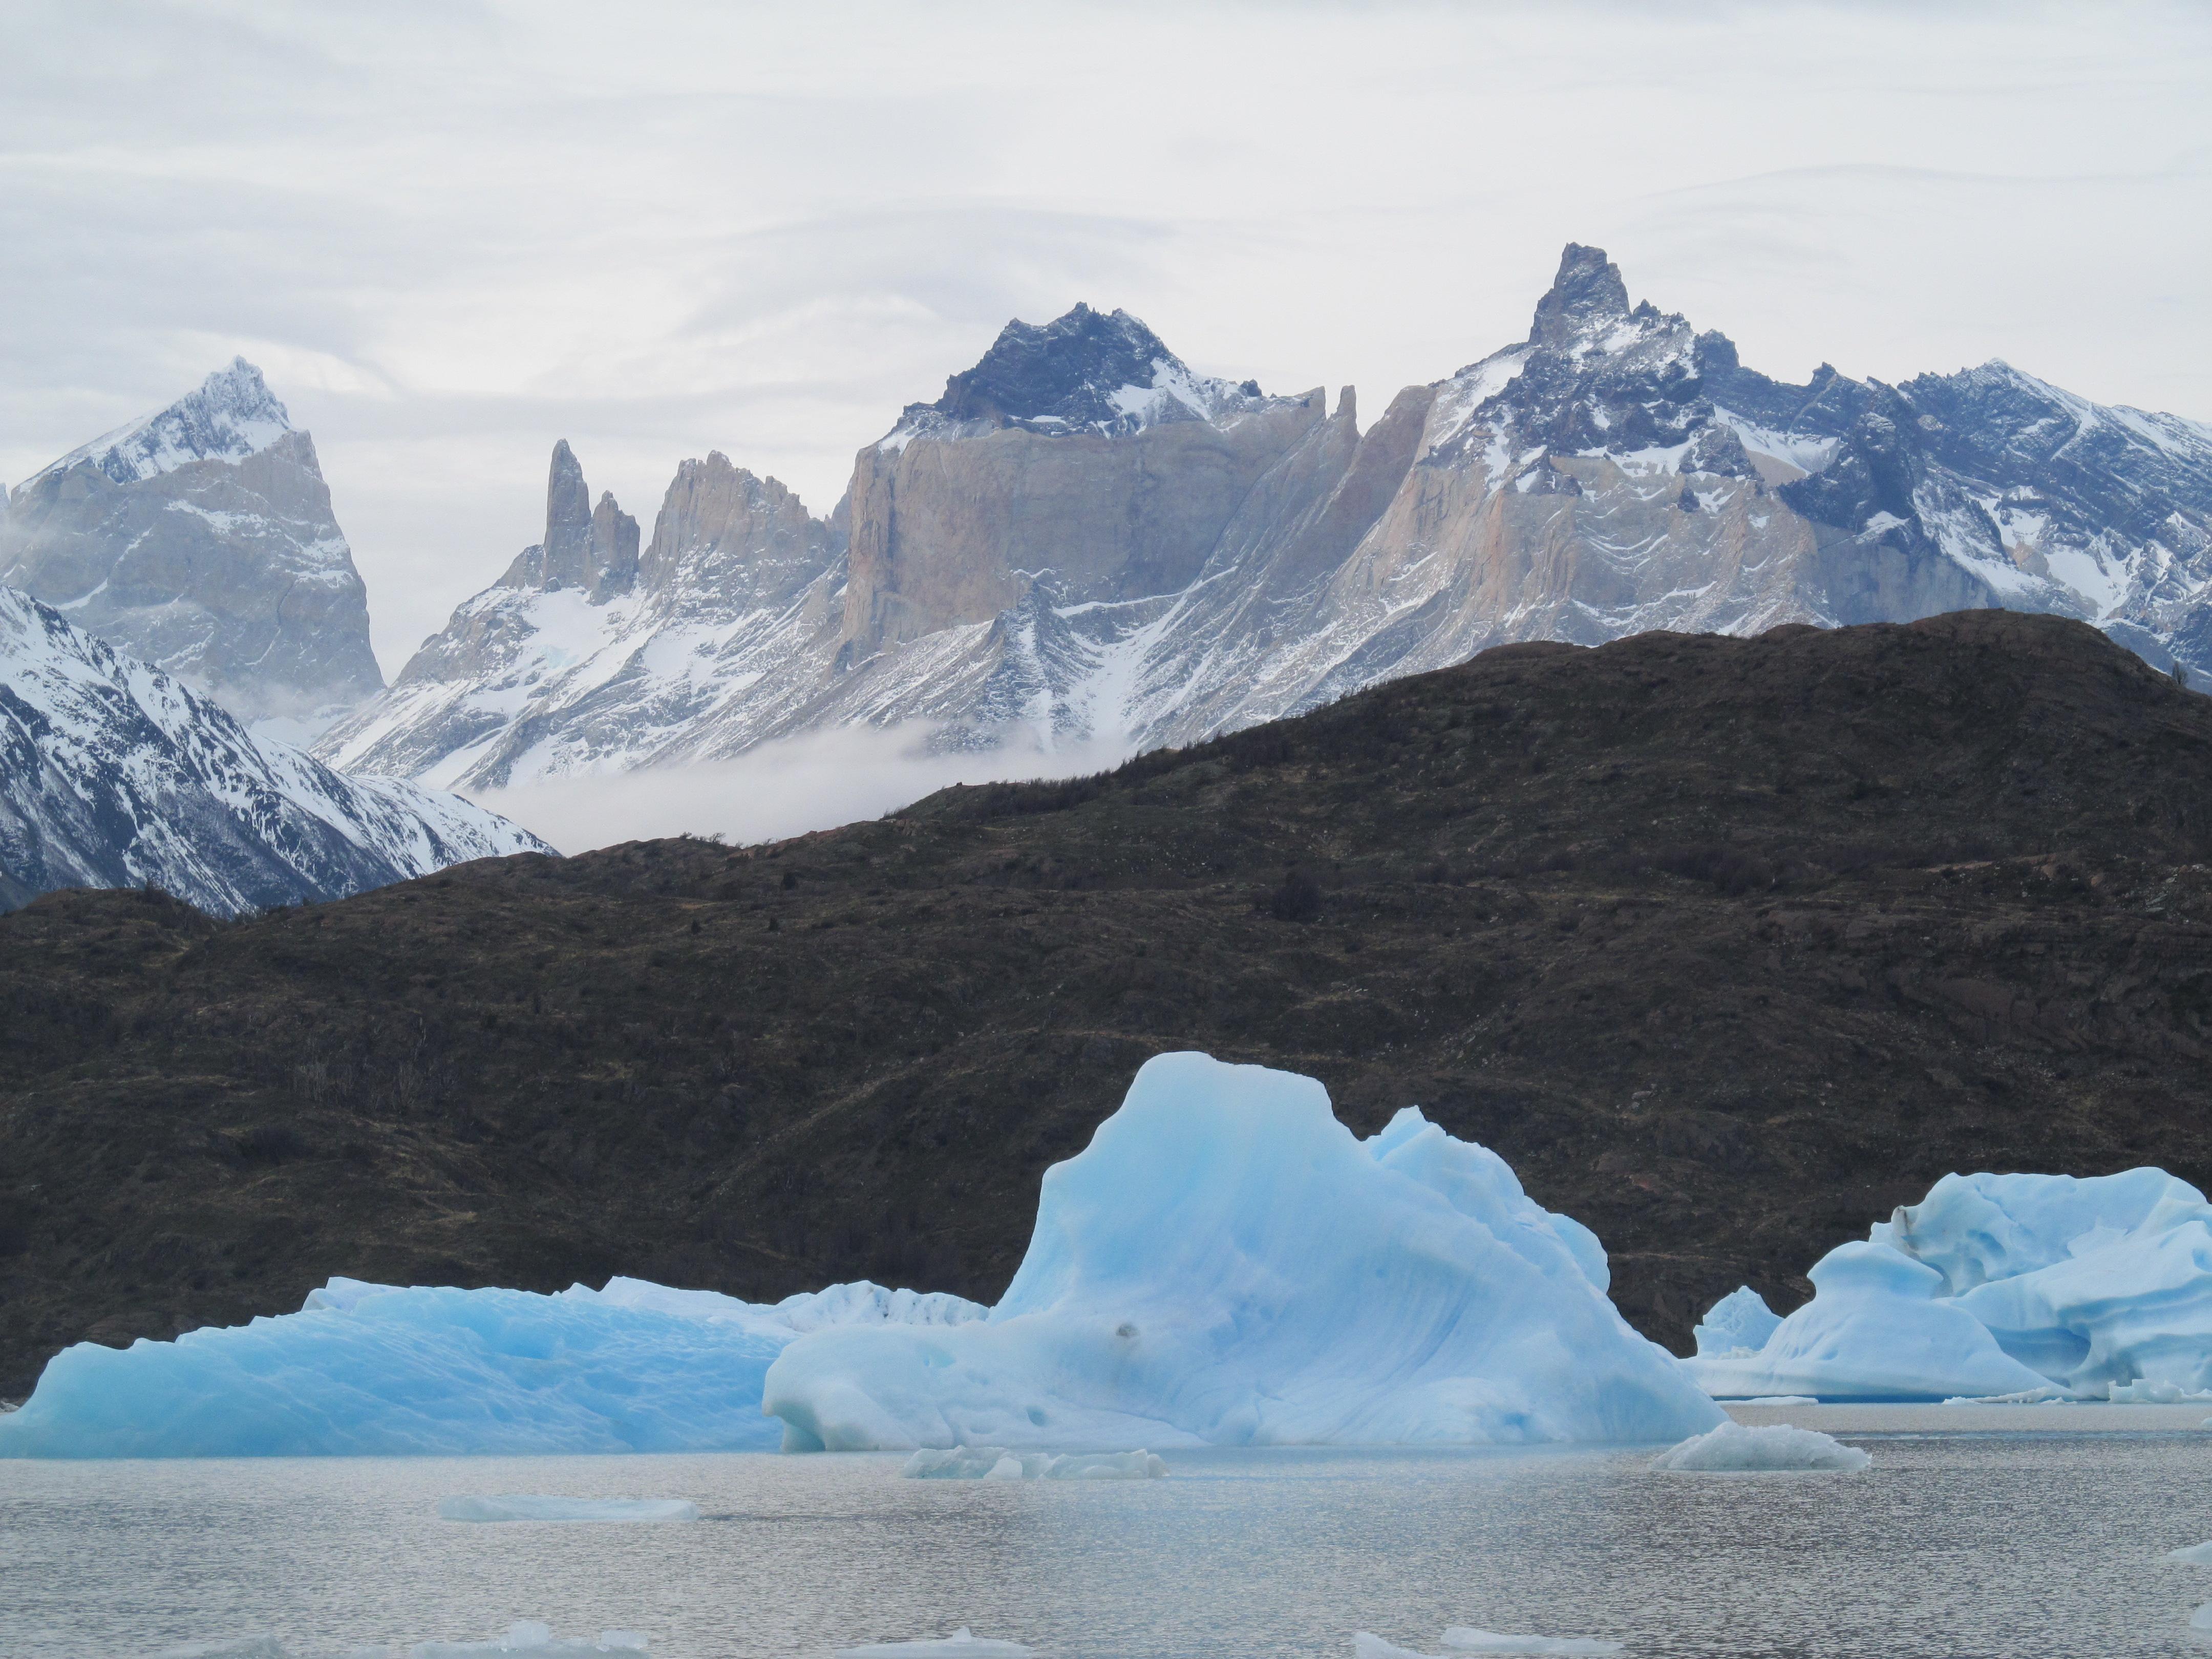 Punta Arenas – Puerto Natales